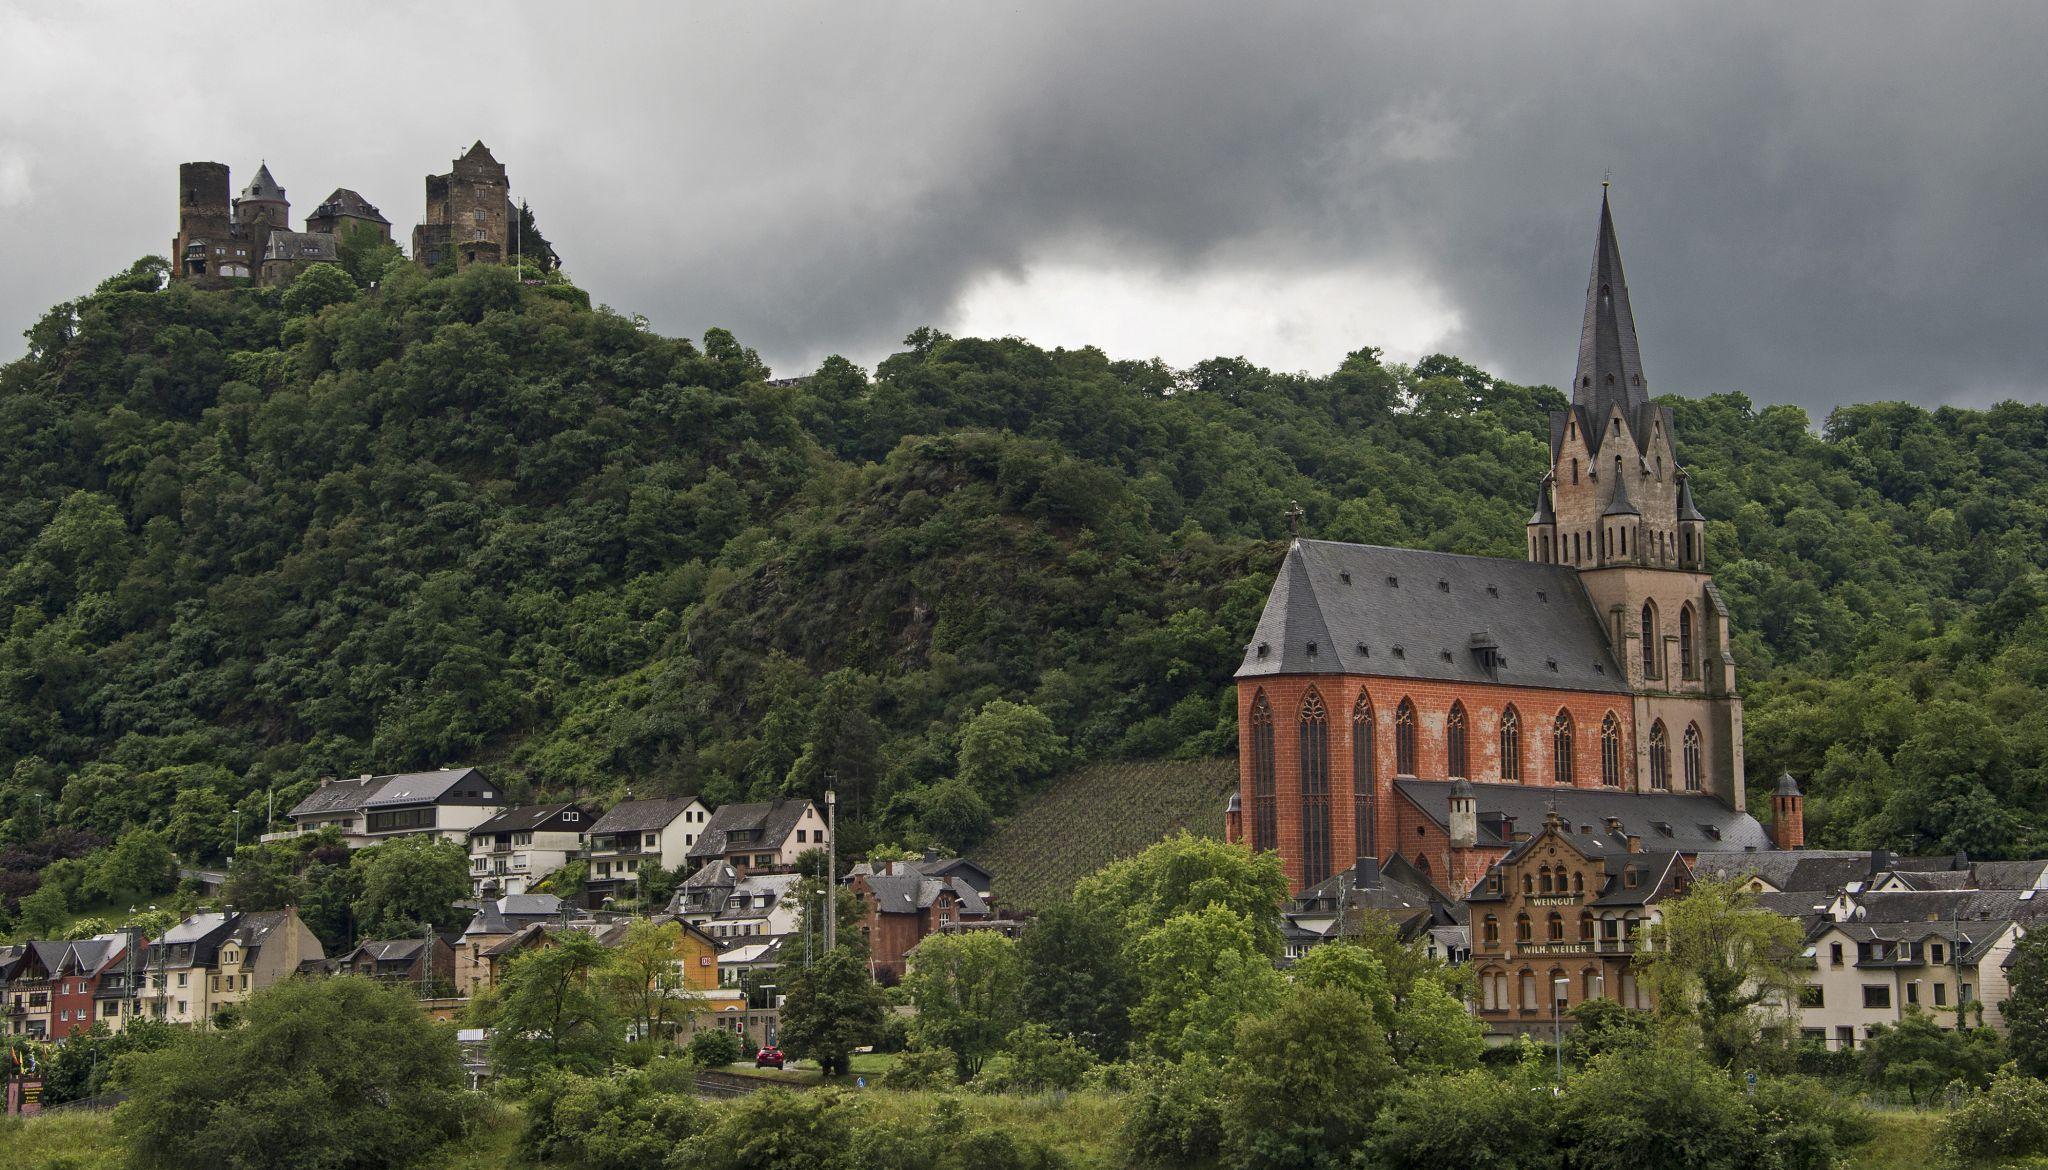 Middle Rhine, Germany, Germany